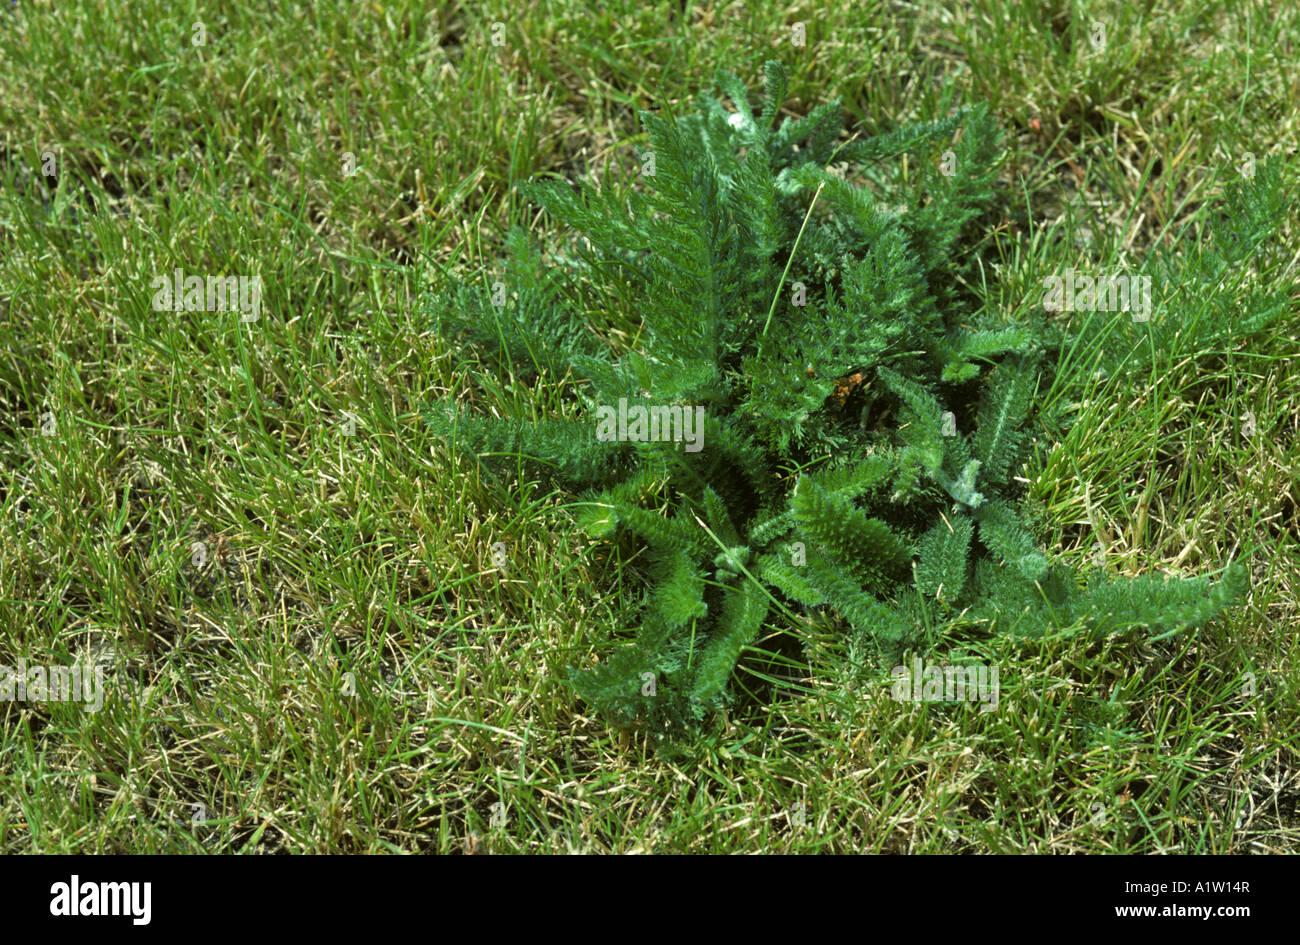 Yarrow Achillea millefolium plant in dry lawn grass Stock Photo ...